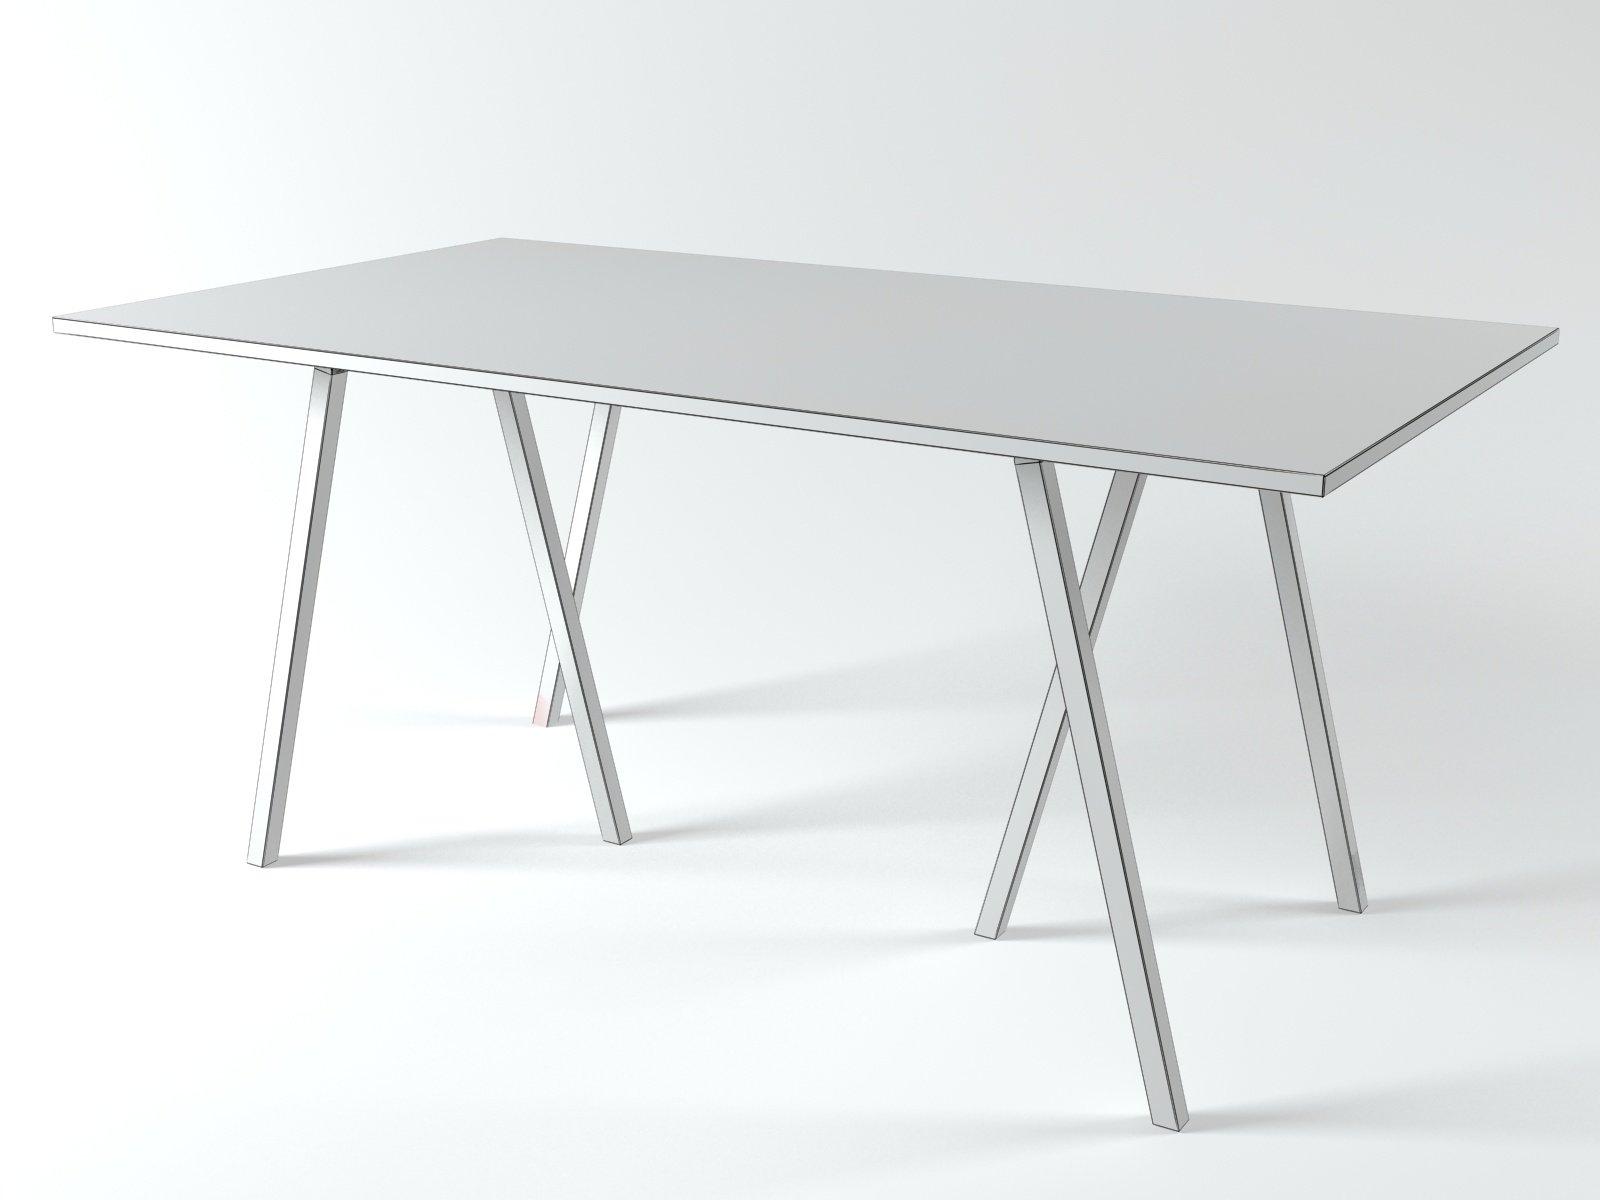 loop stand table 3d model hay. Black Bedroom Furniture Sets. Home Design Ideas